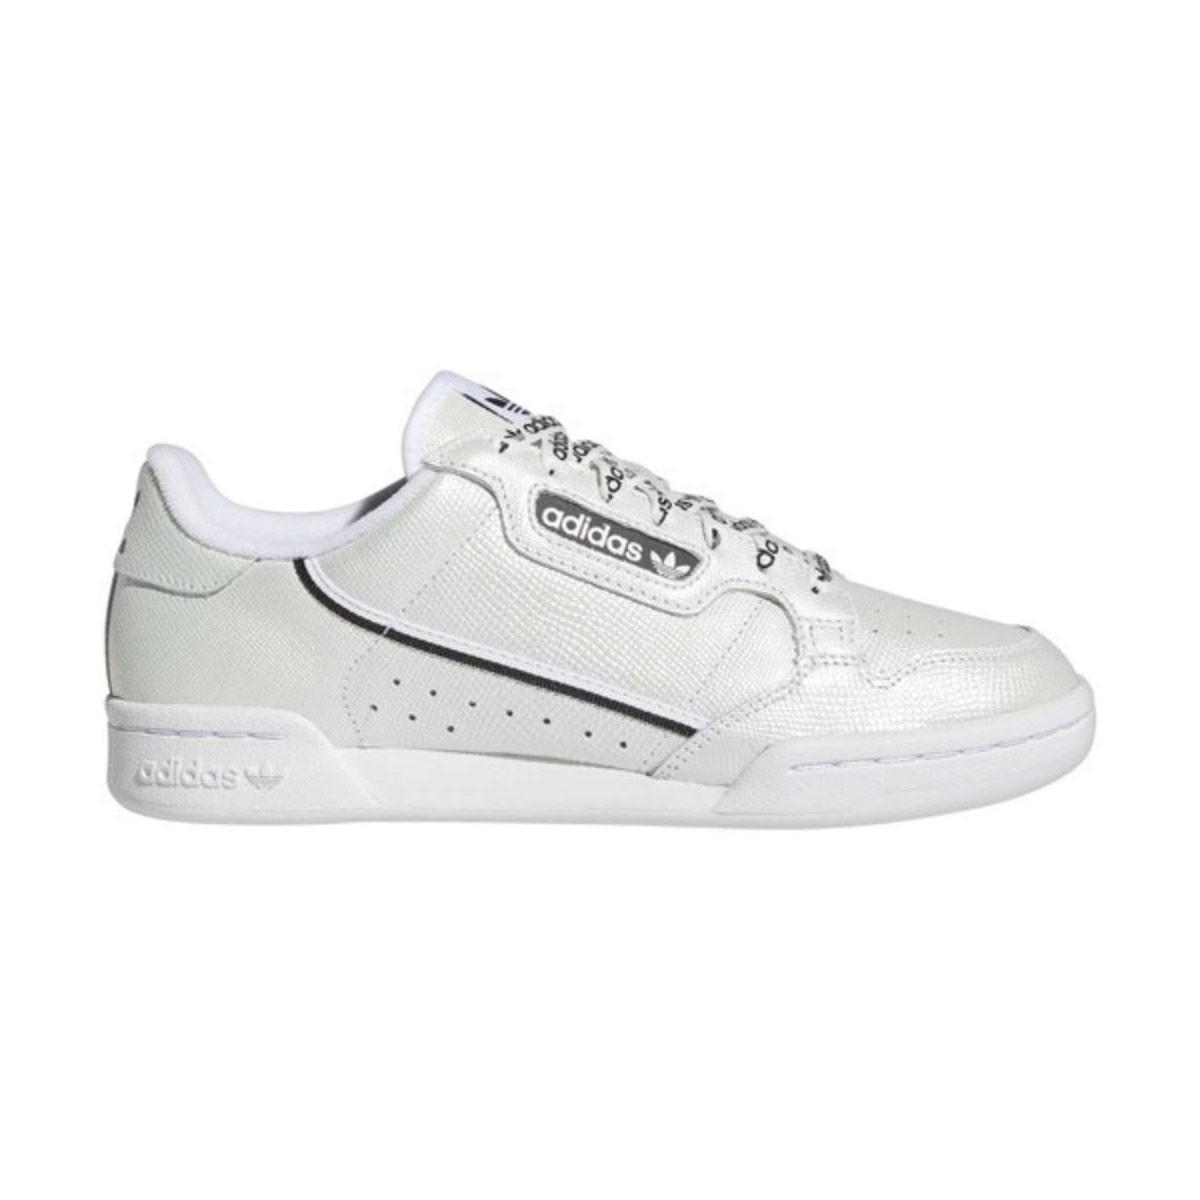 Adidas Continental 80 W FV3417 Δερμάτινο Sneaker Λευκό